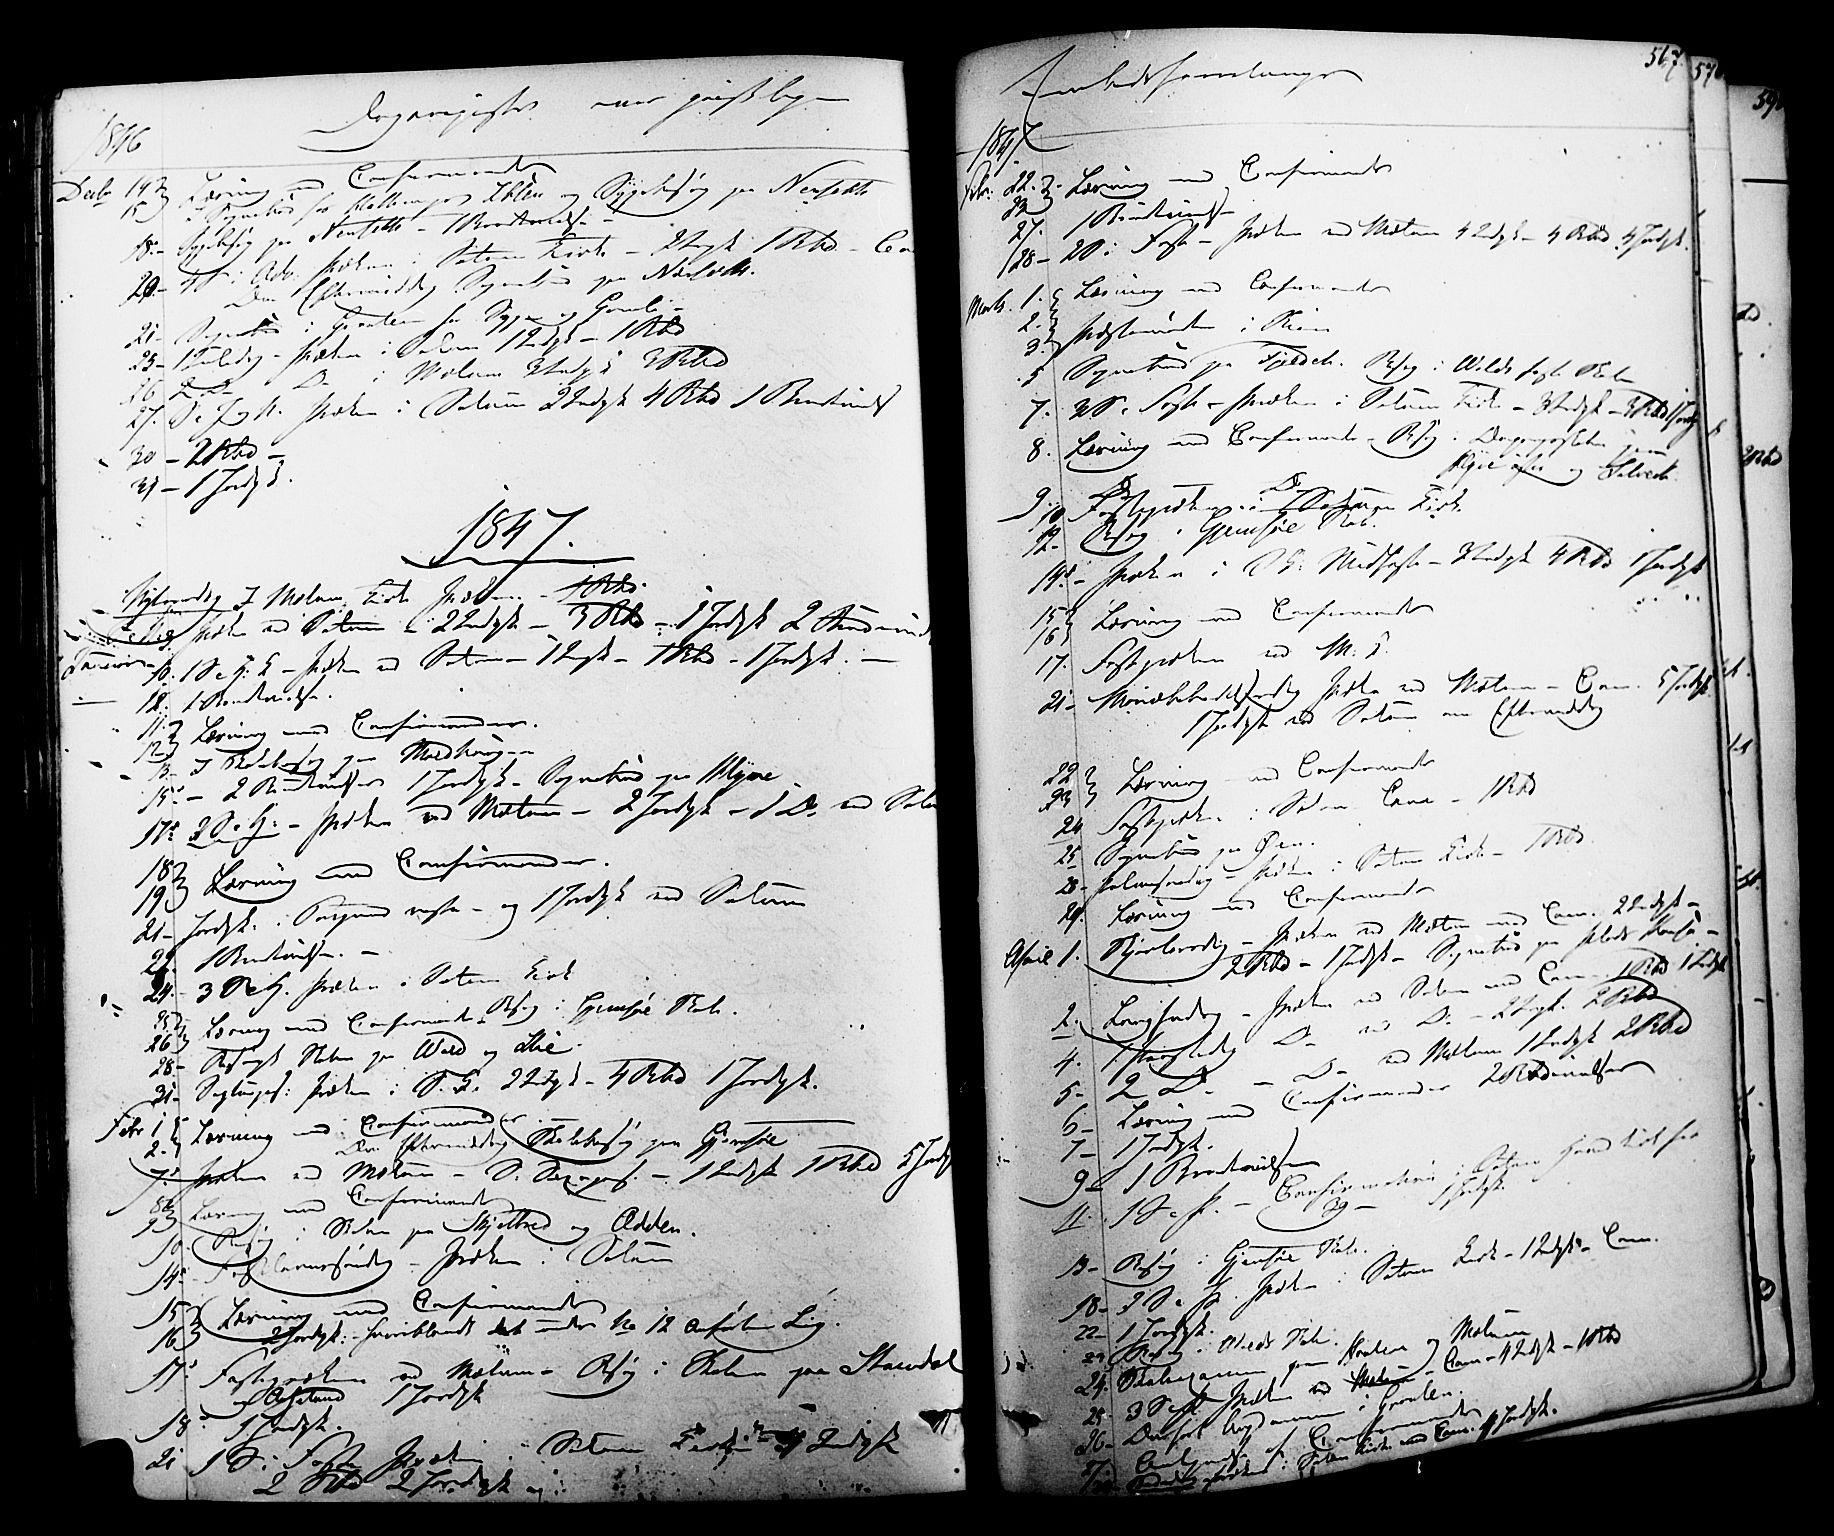 SAKO, Solum kirkebøker, F/Fa/L0006: Ministerialbok nr. I 6, 1844-1855, s. 567